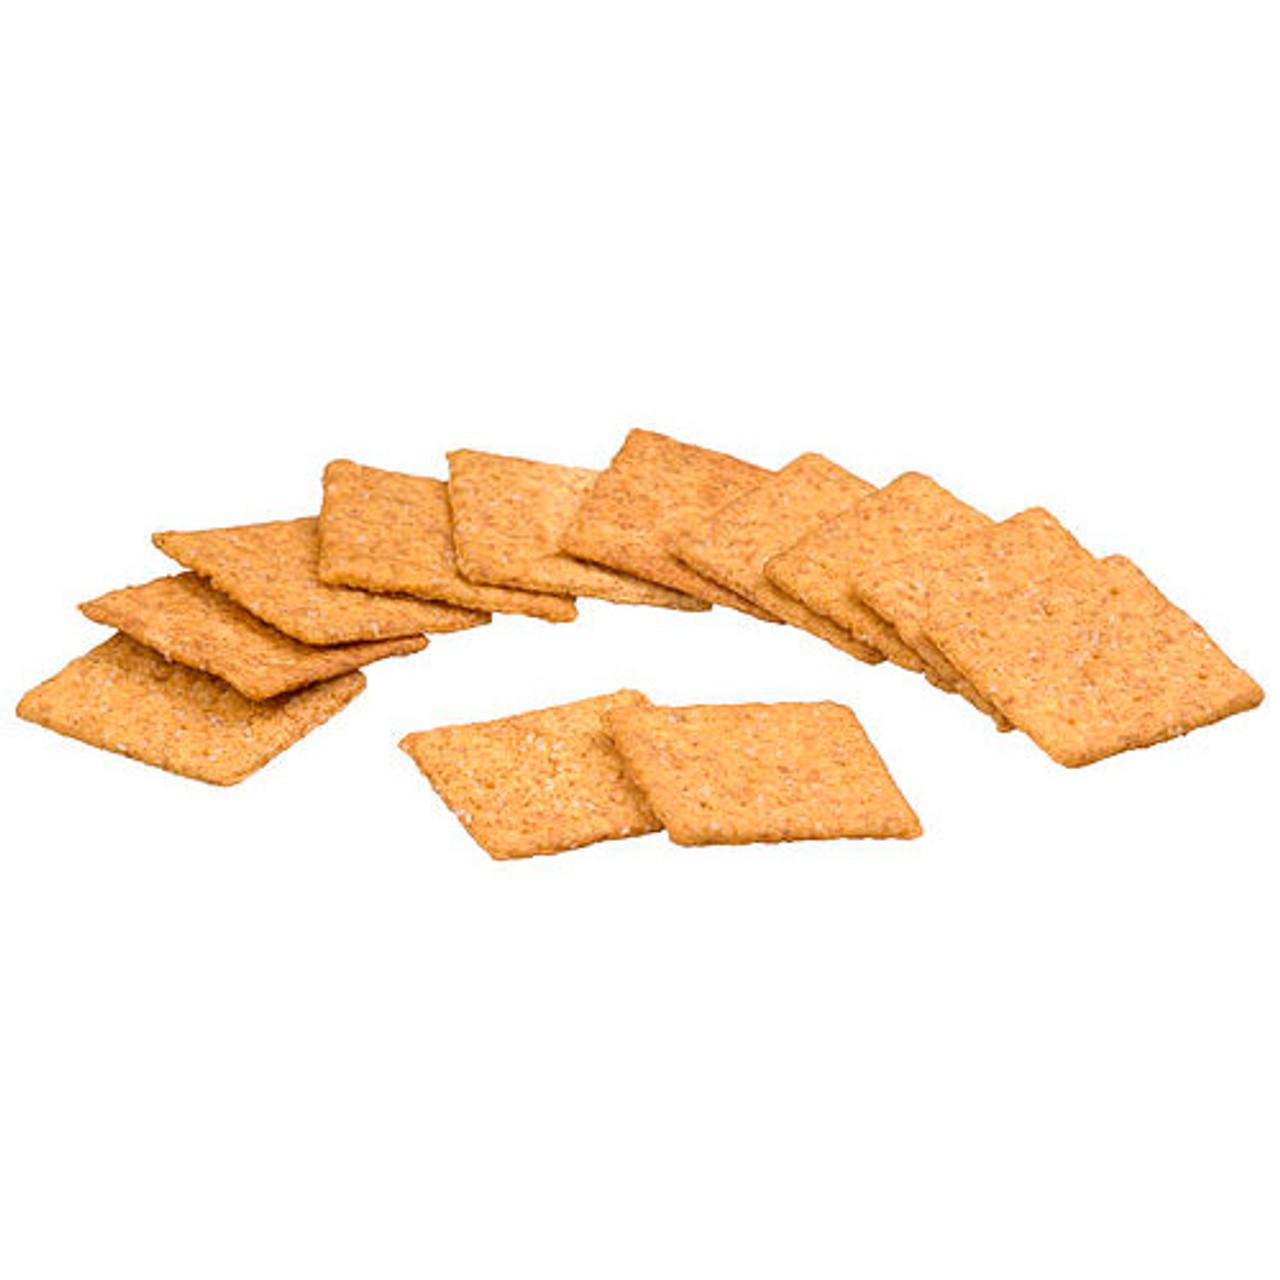 Wheat Thins, Original Whole Grain Crackers, 6 4 oz  Box (1 Count)